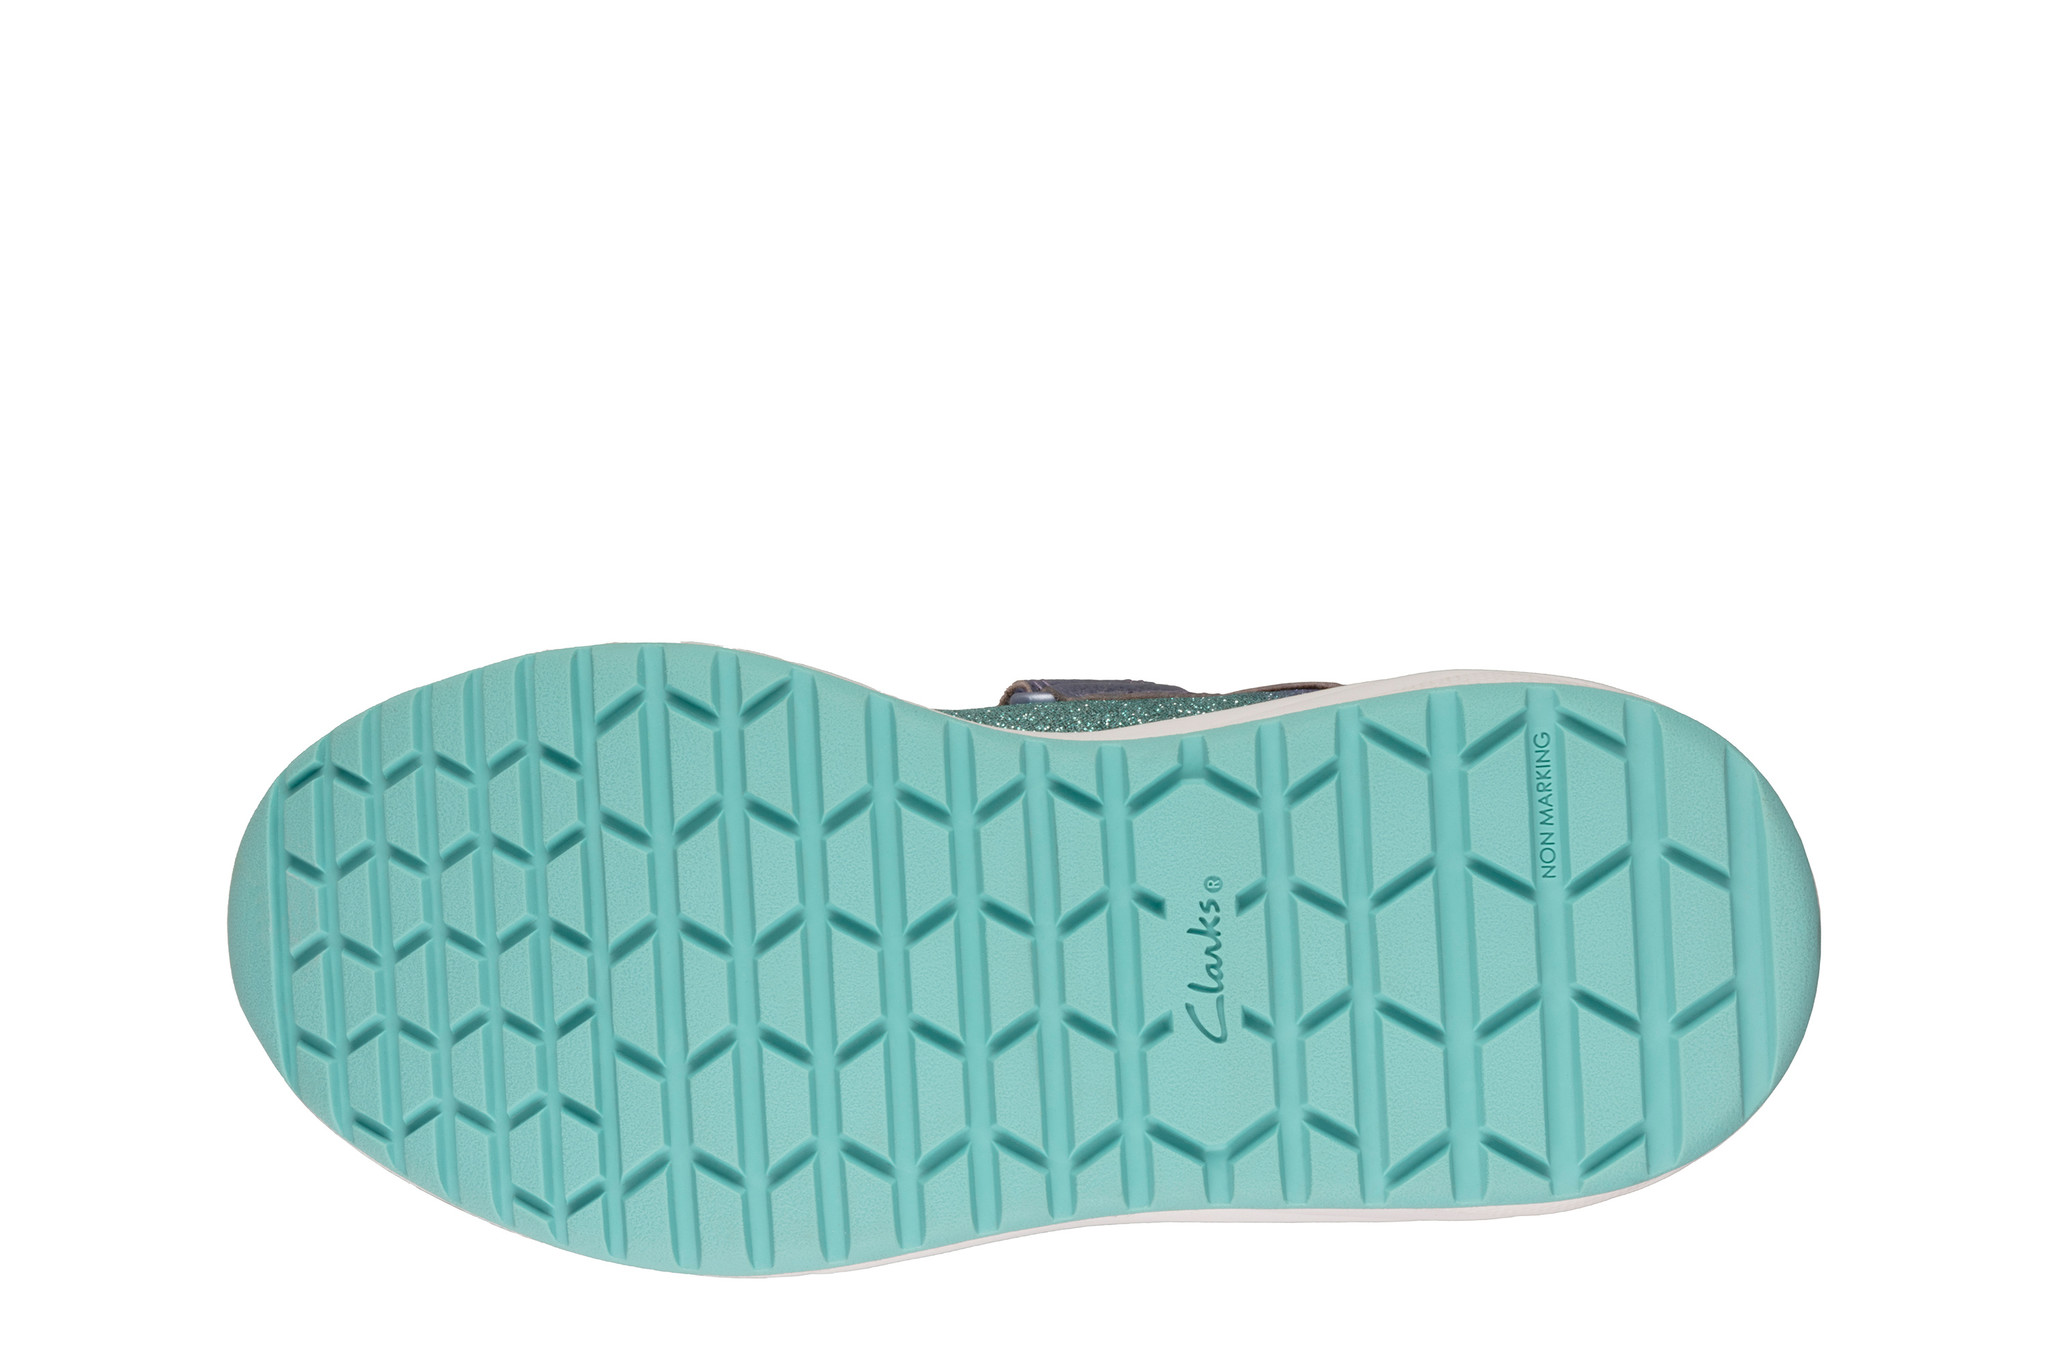 Clarks Aeon Flex Lilac Leather